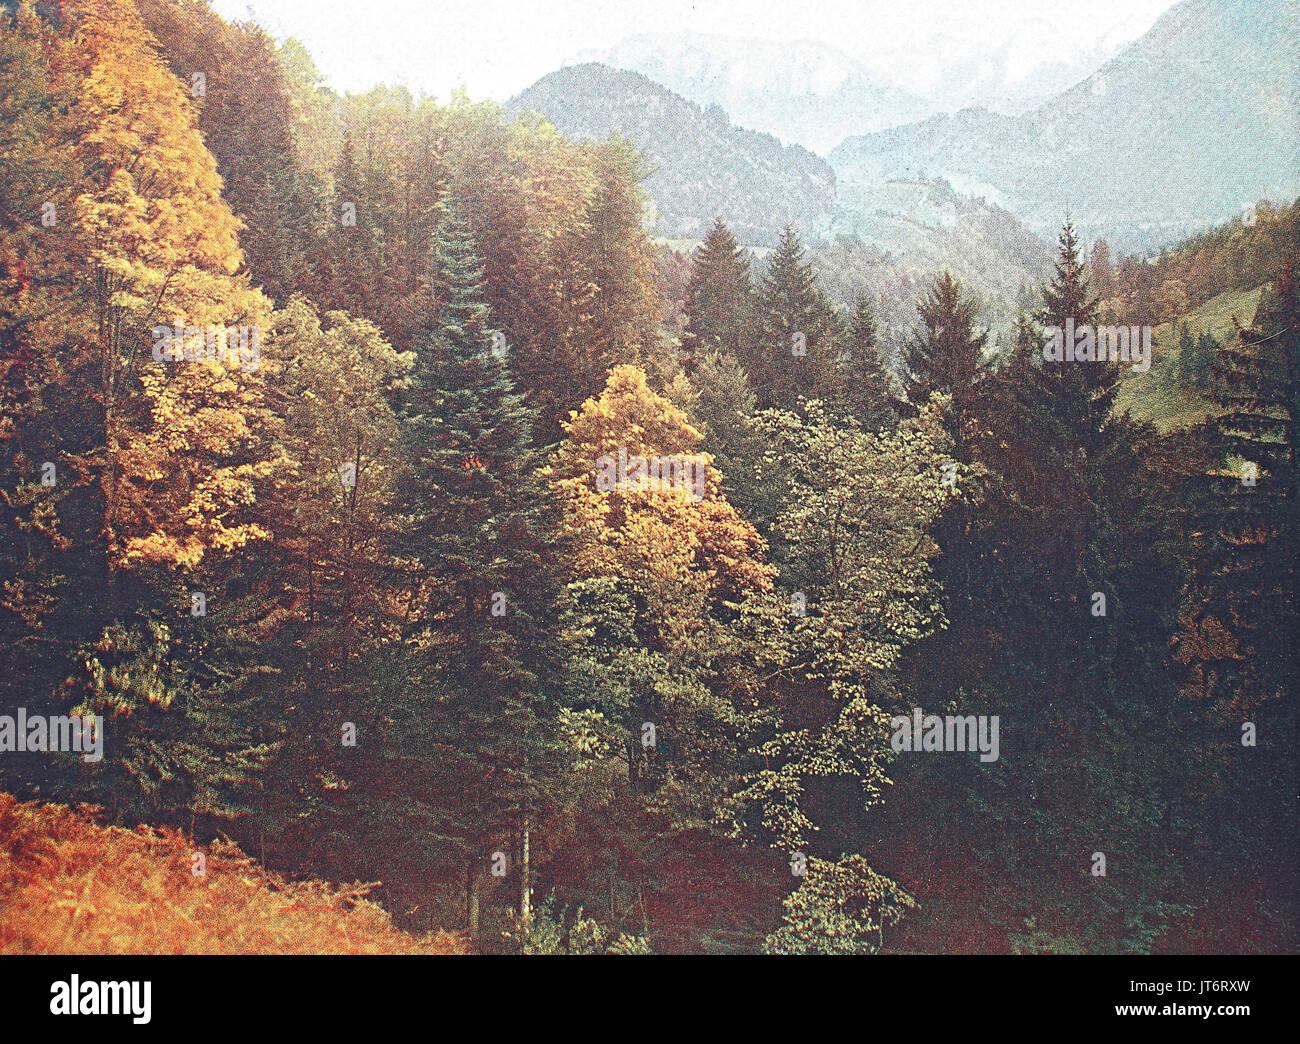 Historical photo of the alps region Tatzelwurm, Bavaria, Germany, Digital improved reproduction of an image published - Stock Image